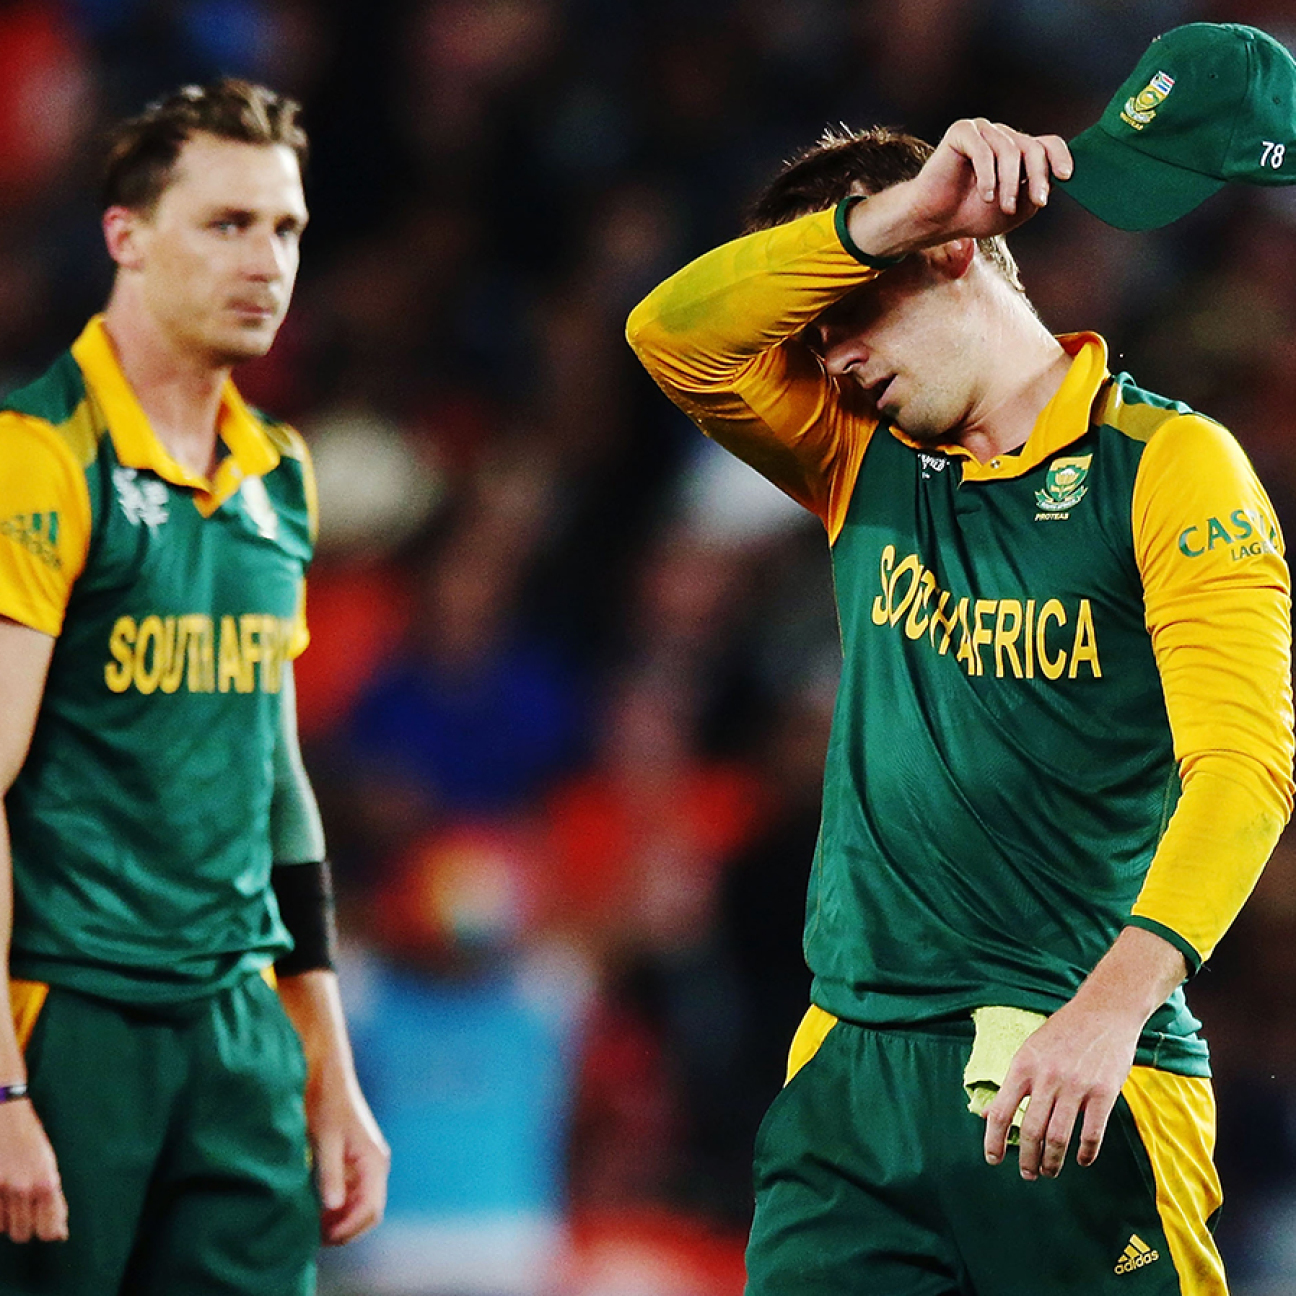 Full Scorecard of South Africa vs New Zealand 1st Semi-Final 2014/15 -  Score Report   ESPNcricinfo.com